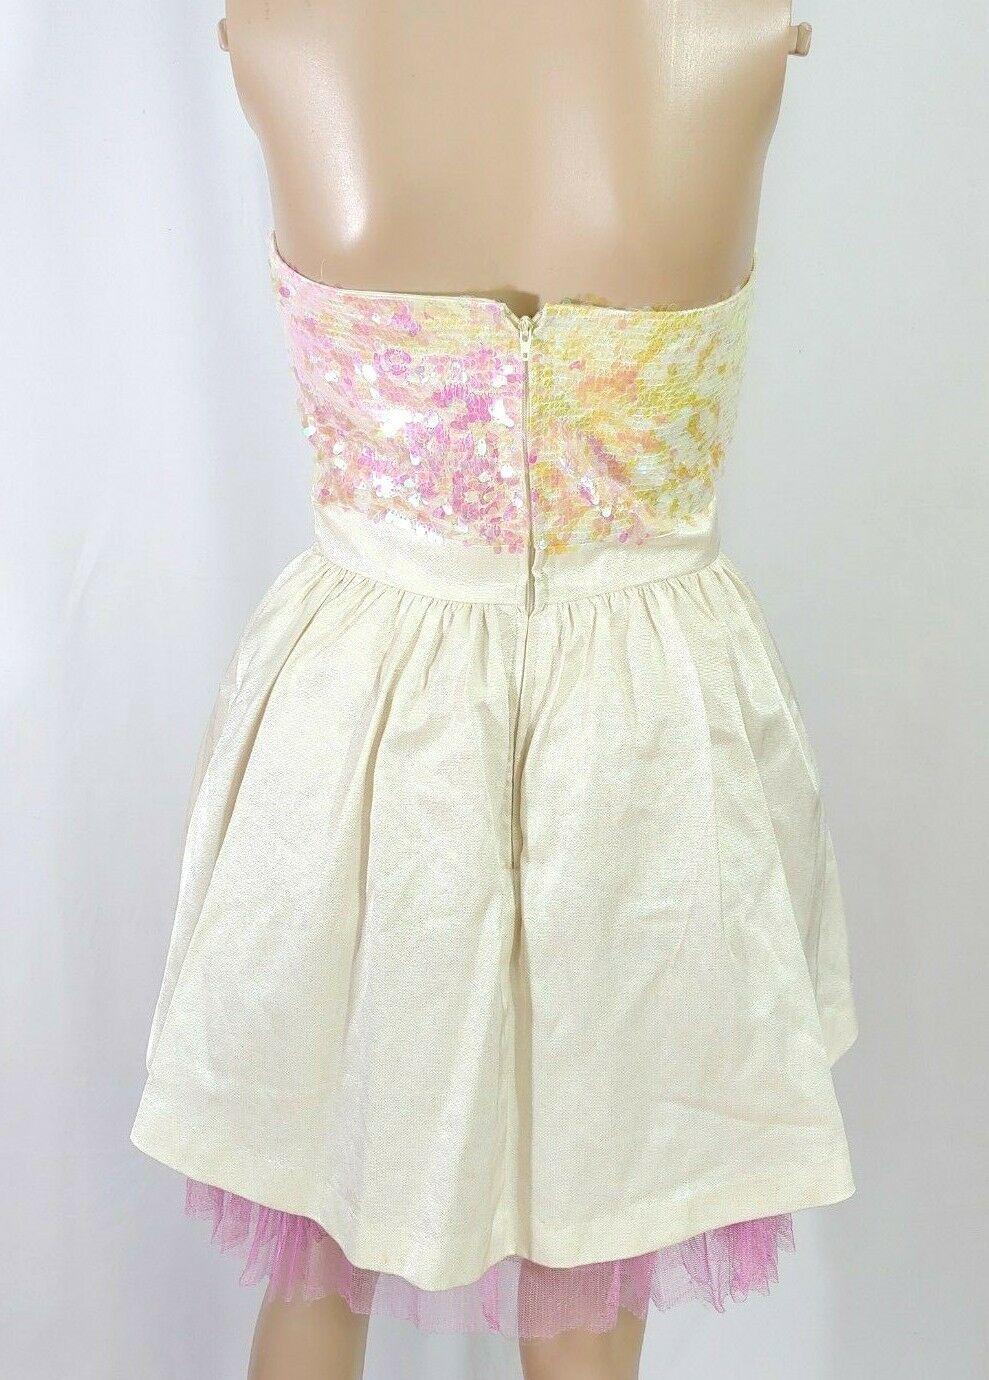 Betsey Johnson White Iridescent Pink Sequin Tulle Corset Tea Party Dress SZ 2